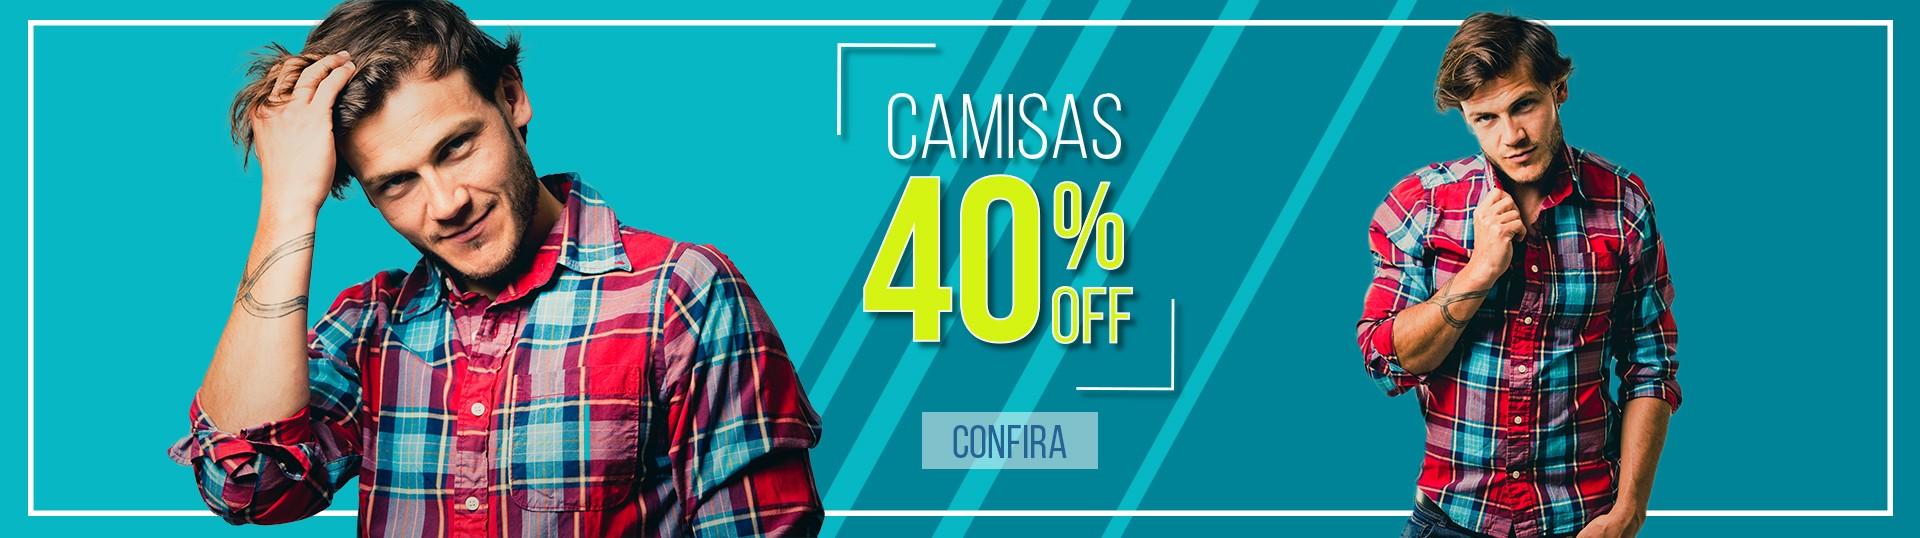 Camisas 40%off